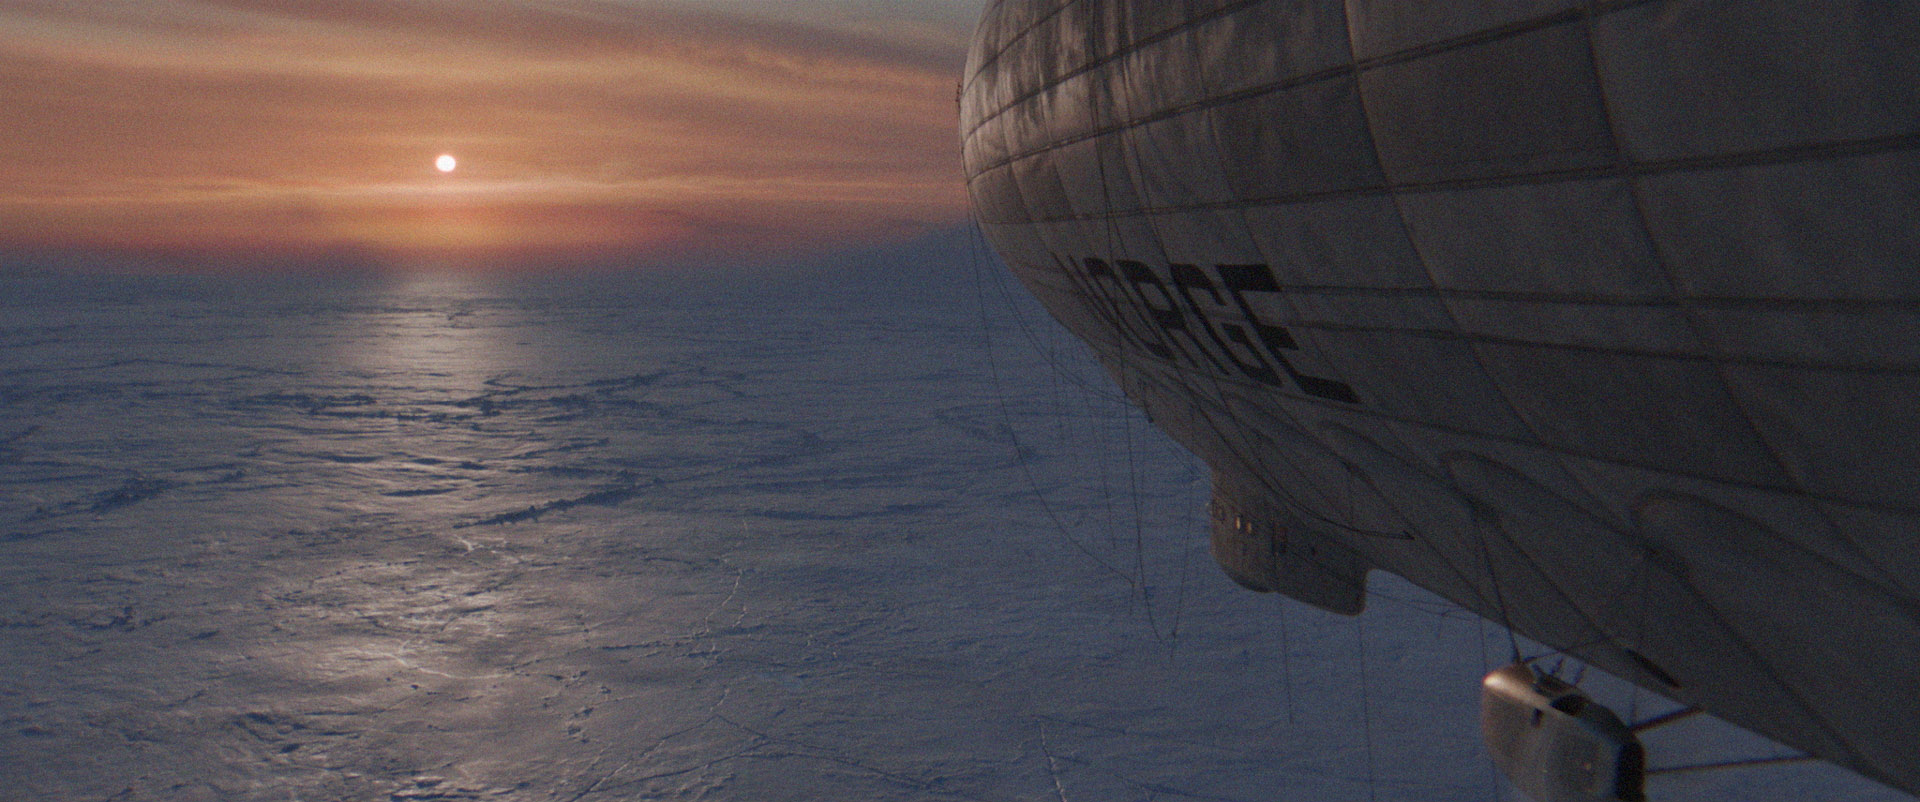 am_airship_01.jpg